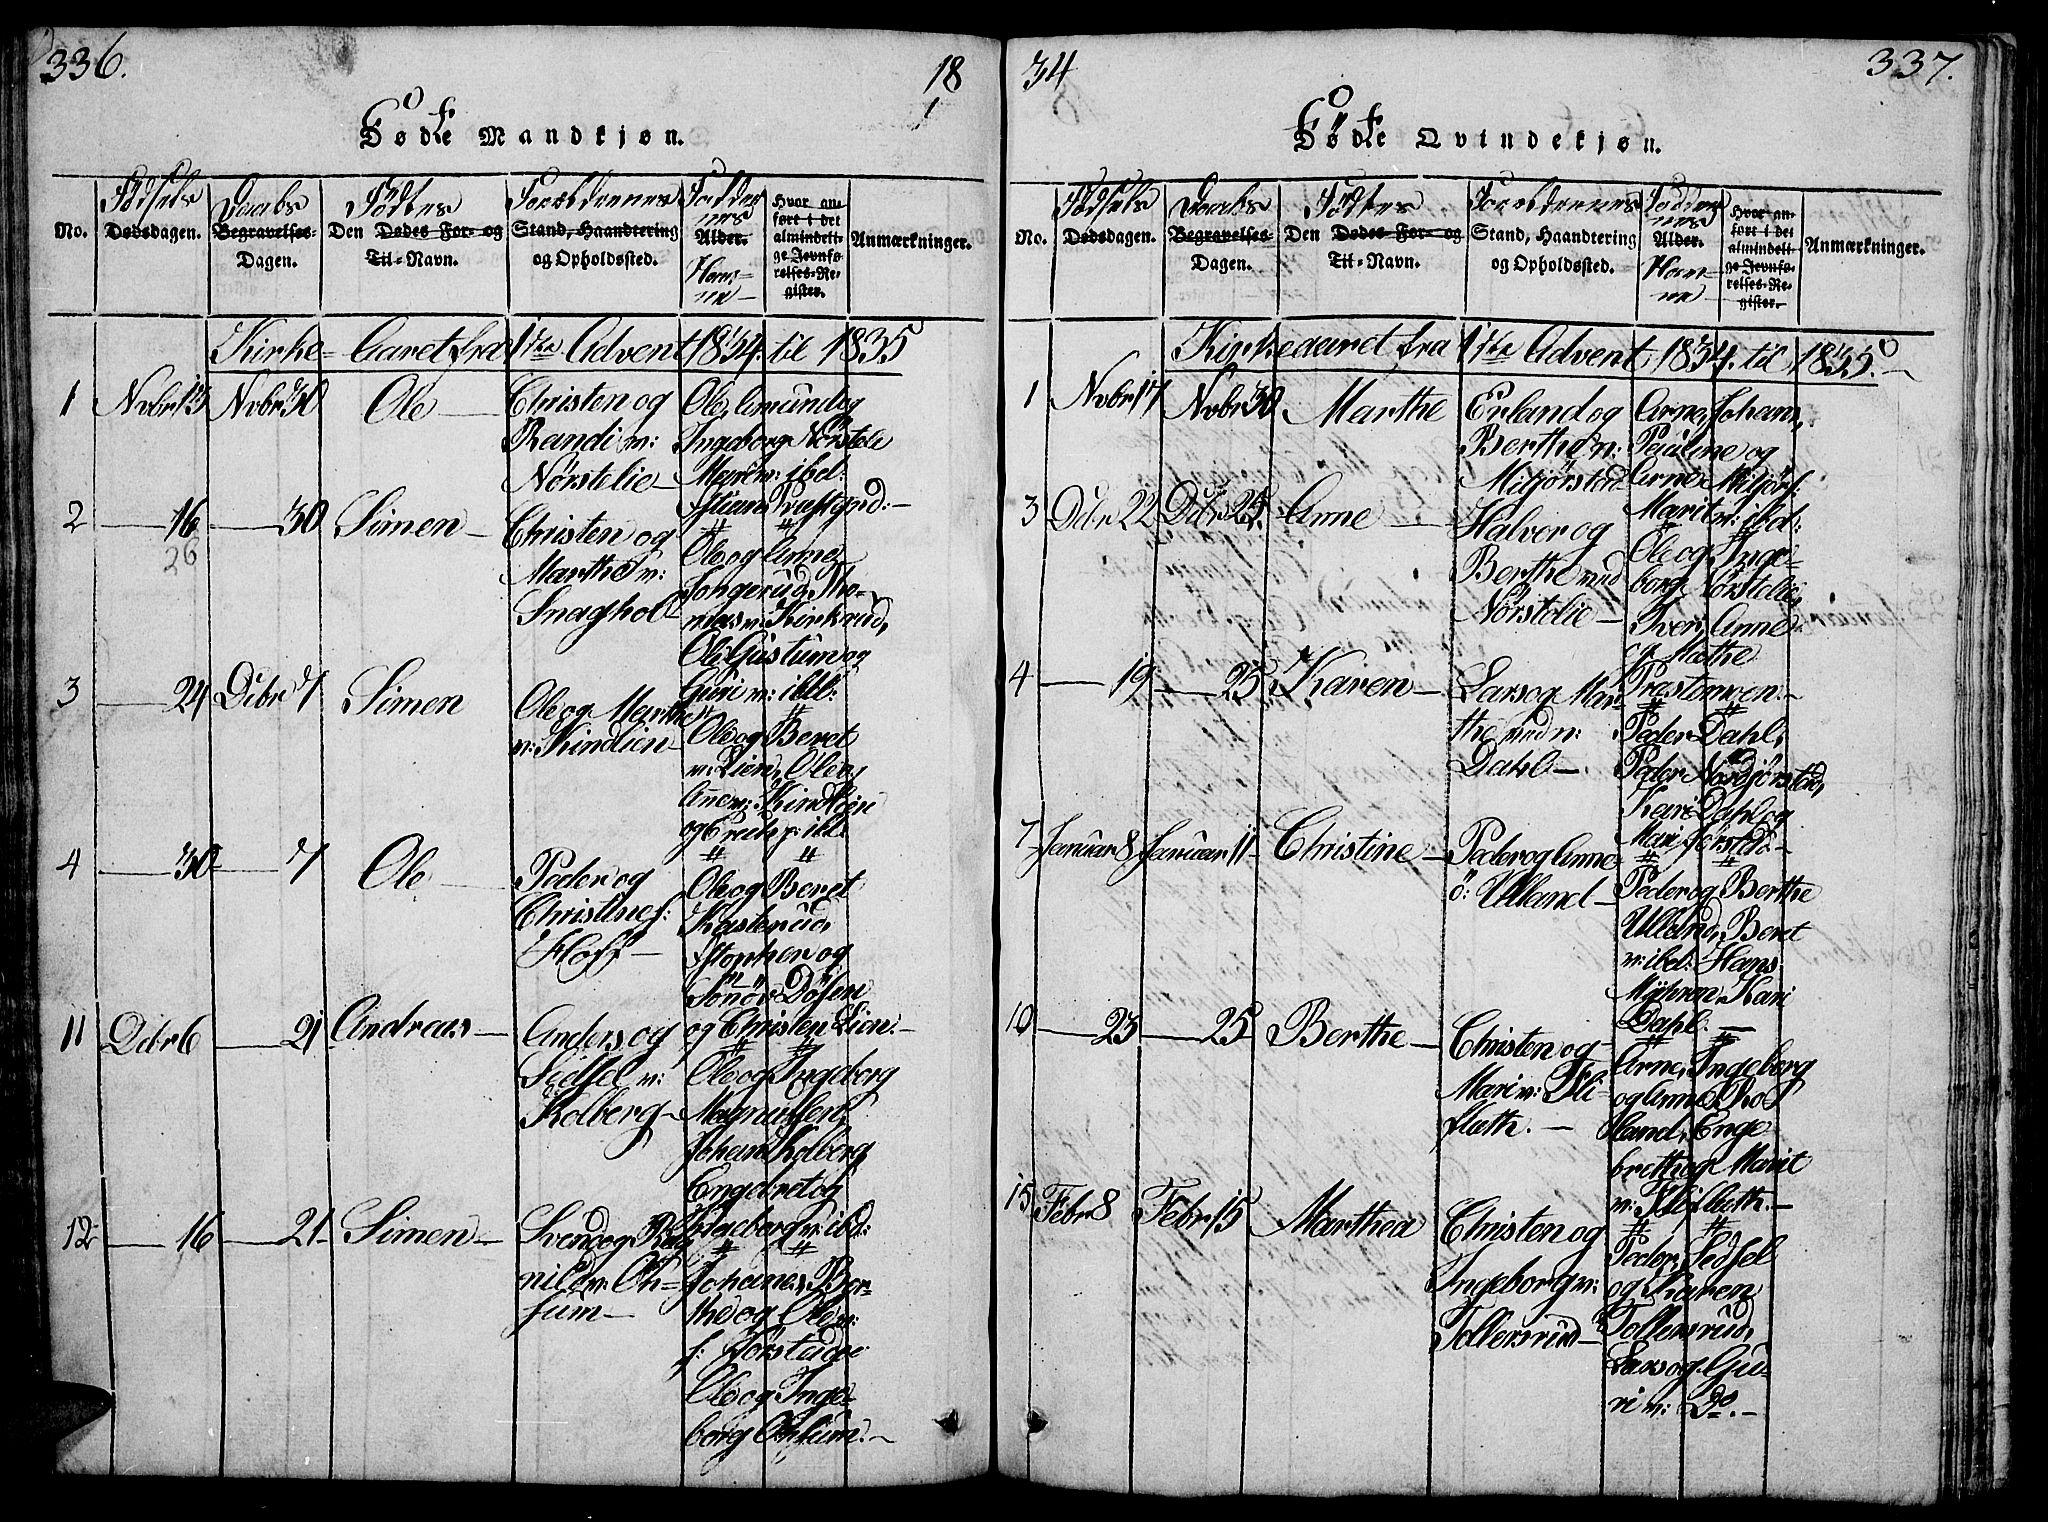 SAH, Fåberg prestekontor, Klokkerbok nr. 4, 1818-1837, s. 336-337